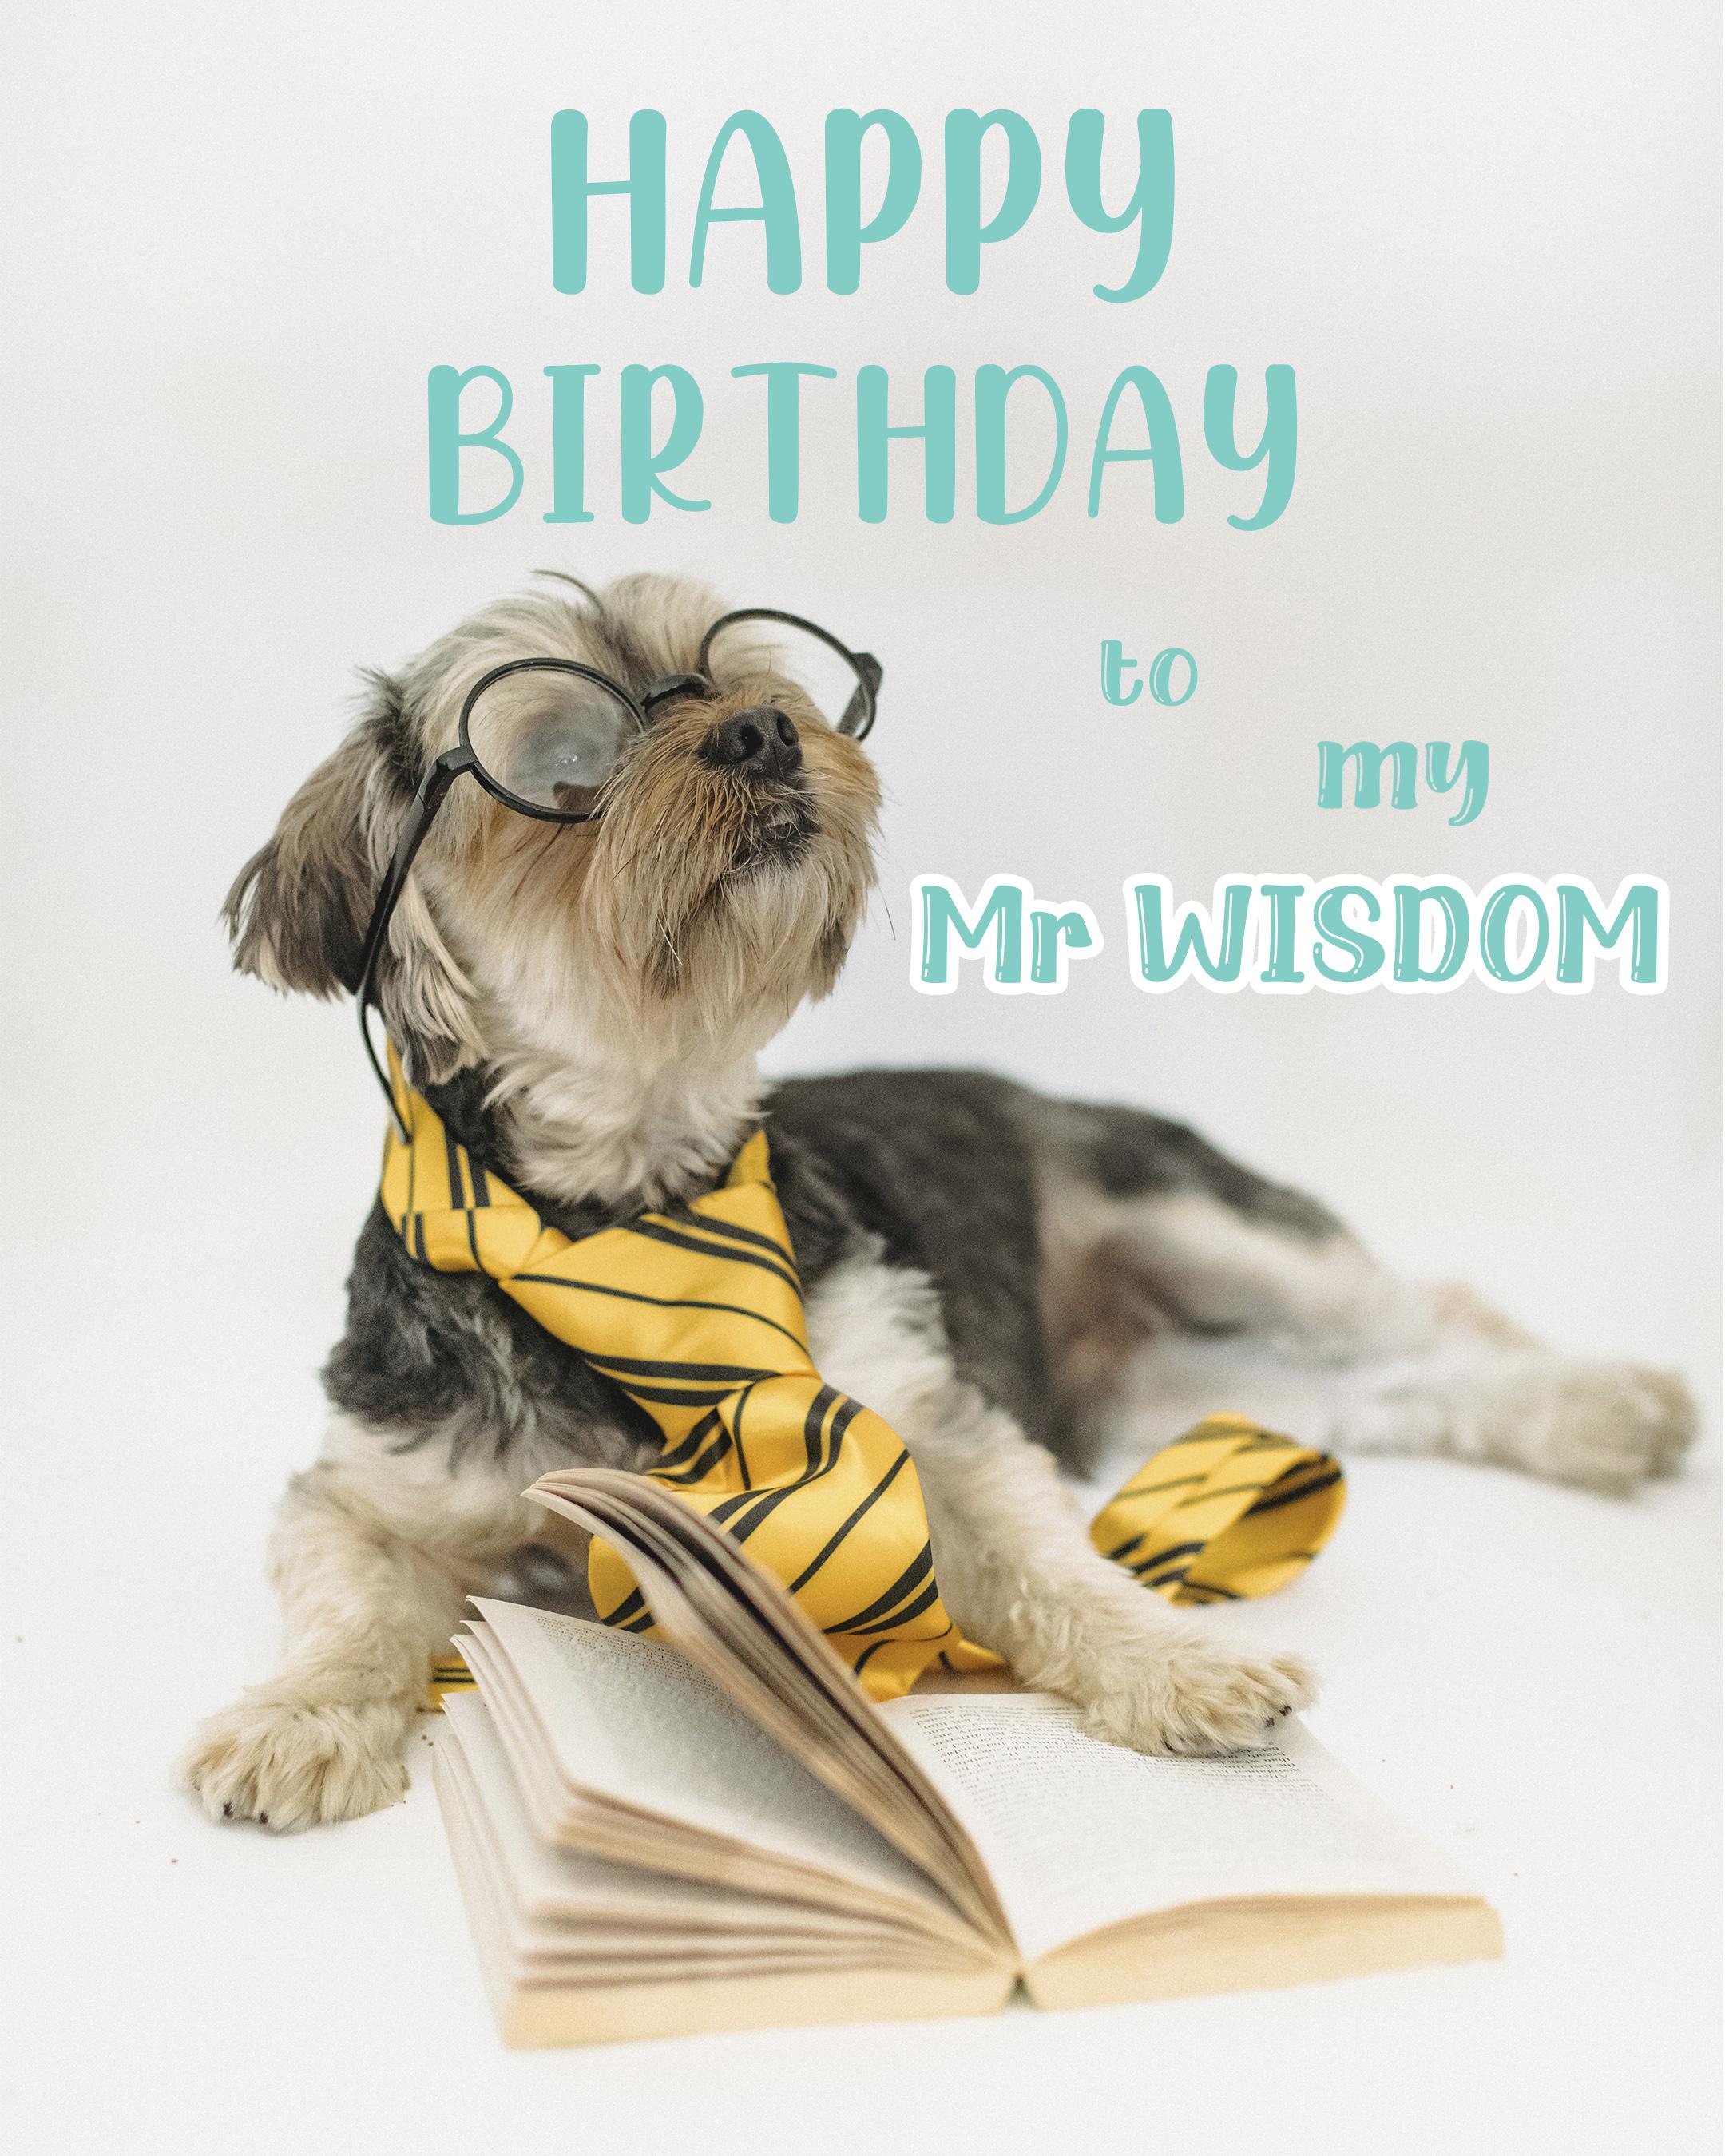 Free Cute Happy Birthday Image For Husband With Dog - birthdayimg.com